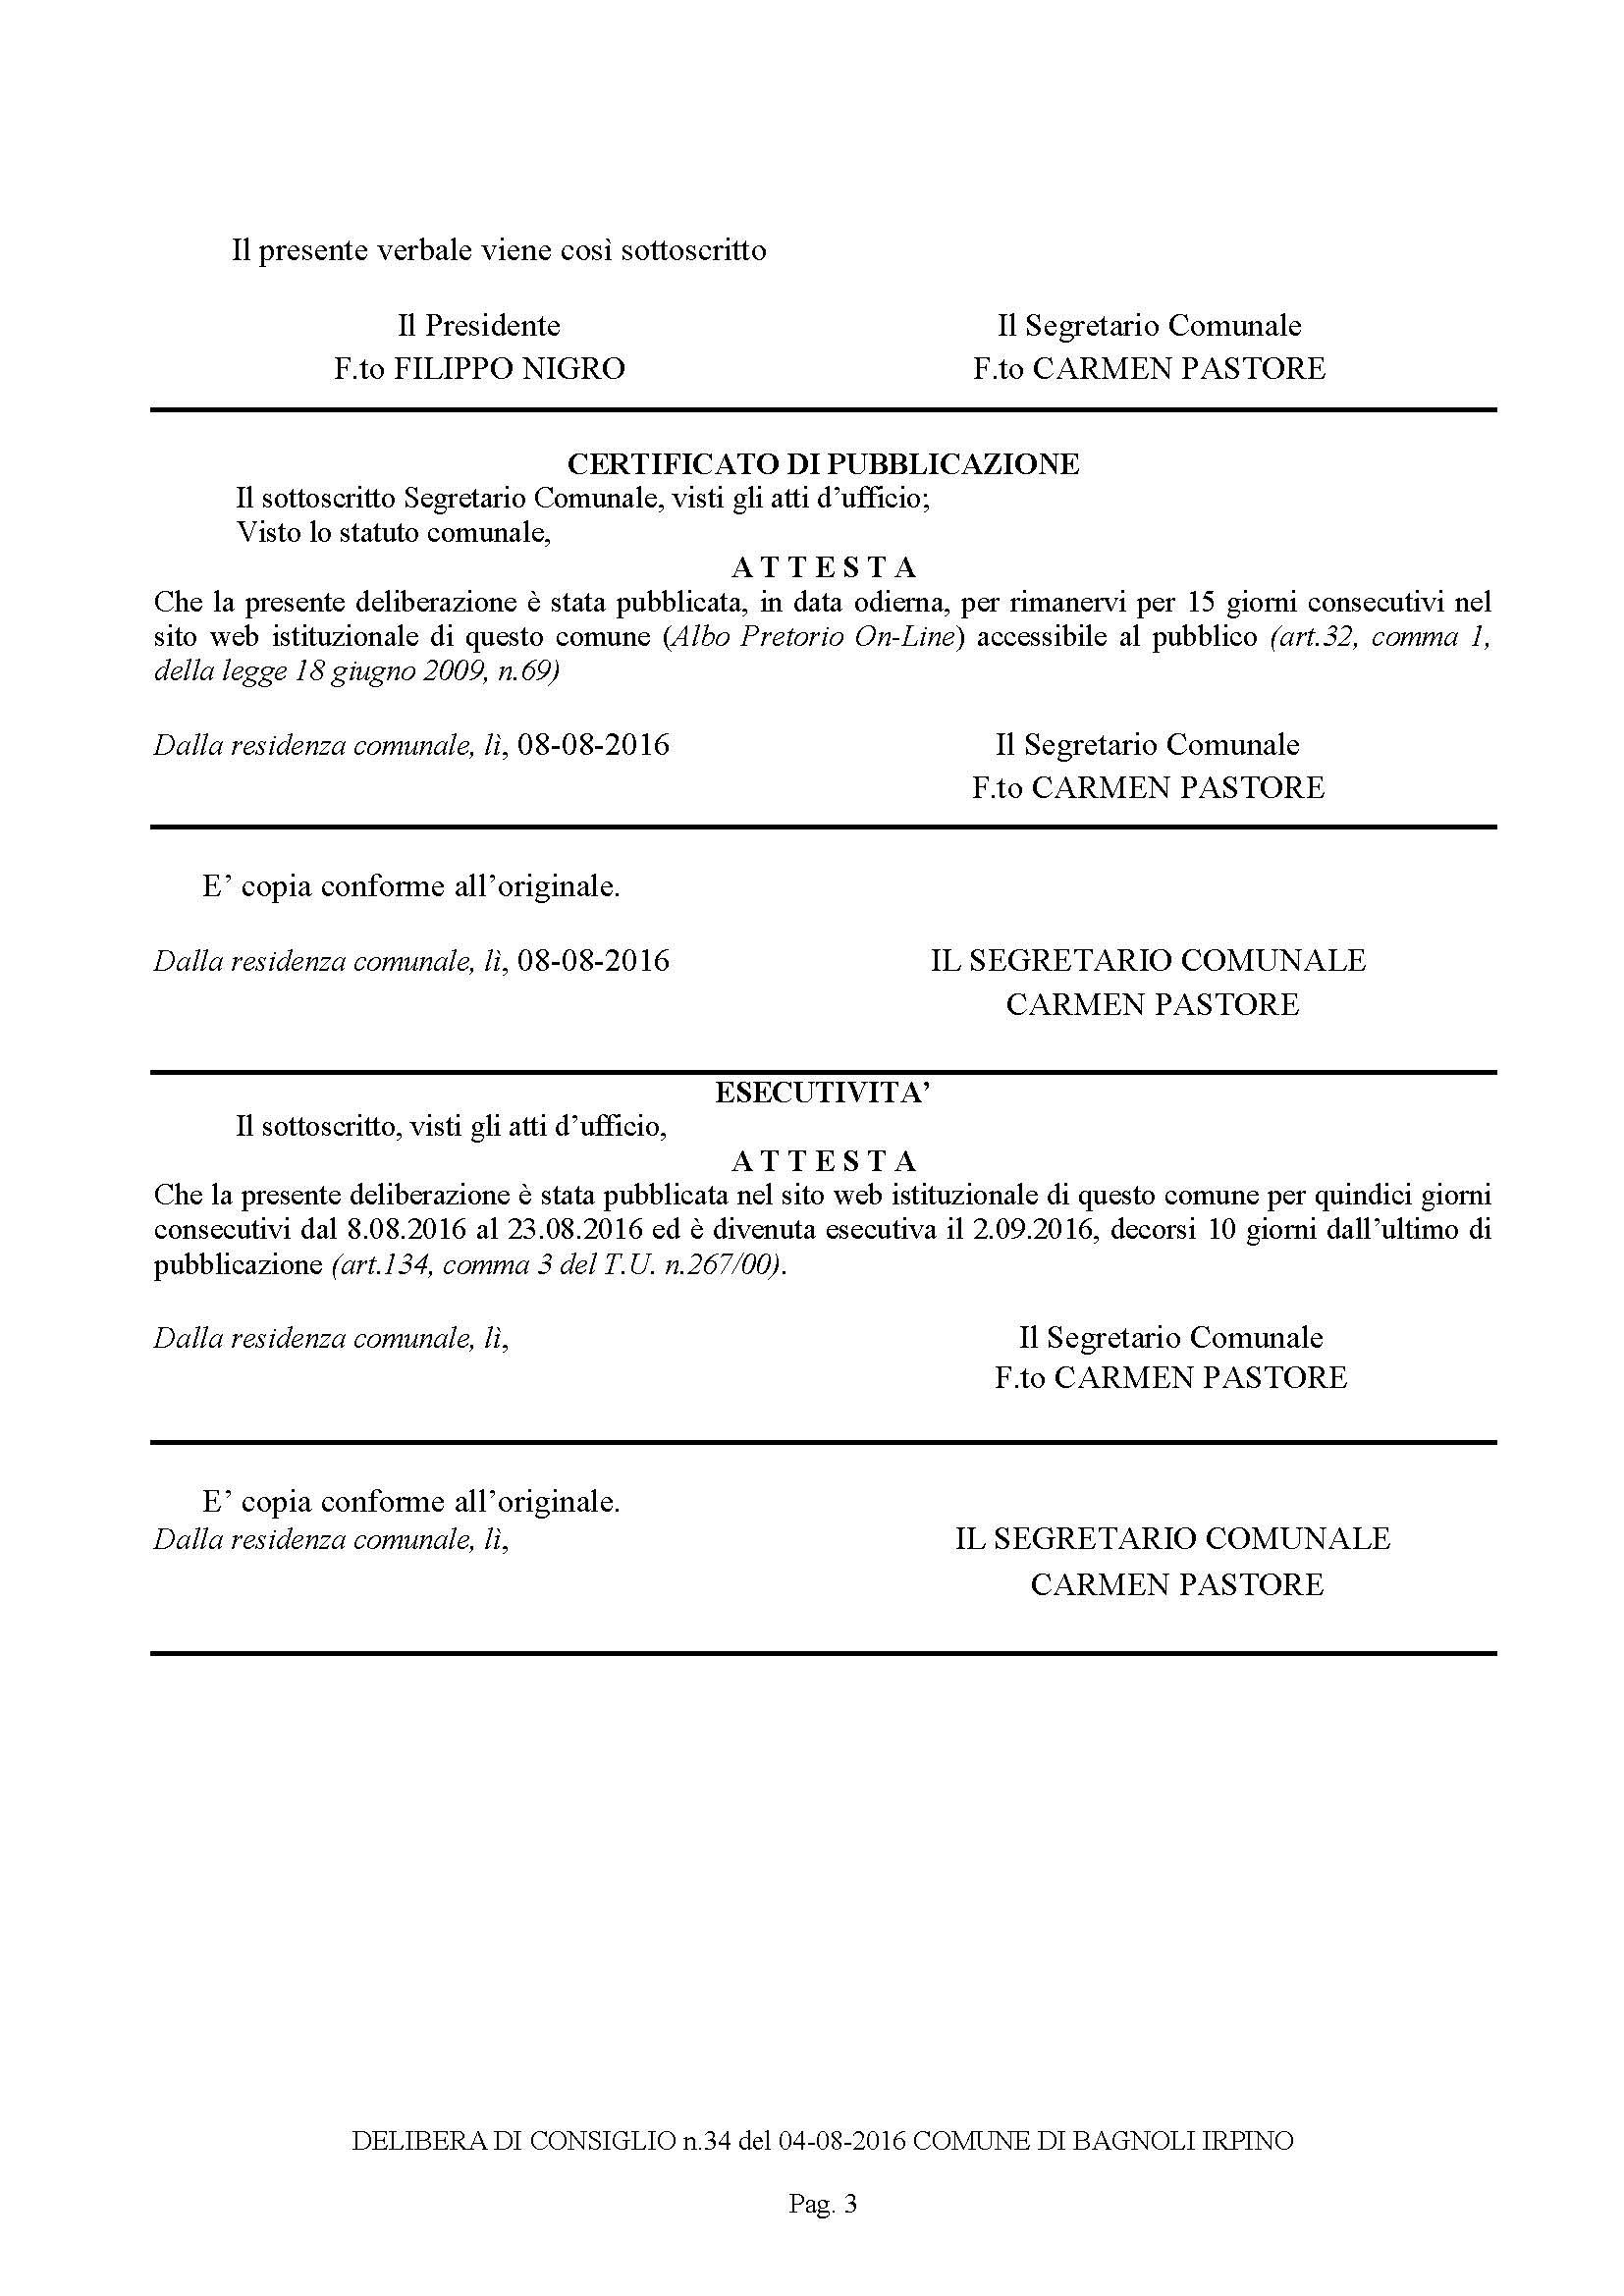 Bagnoli-Verbale-CONSIGLIO-n-34-agosto-2016_Pagina_3